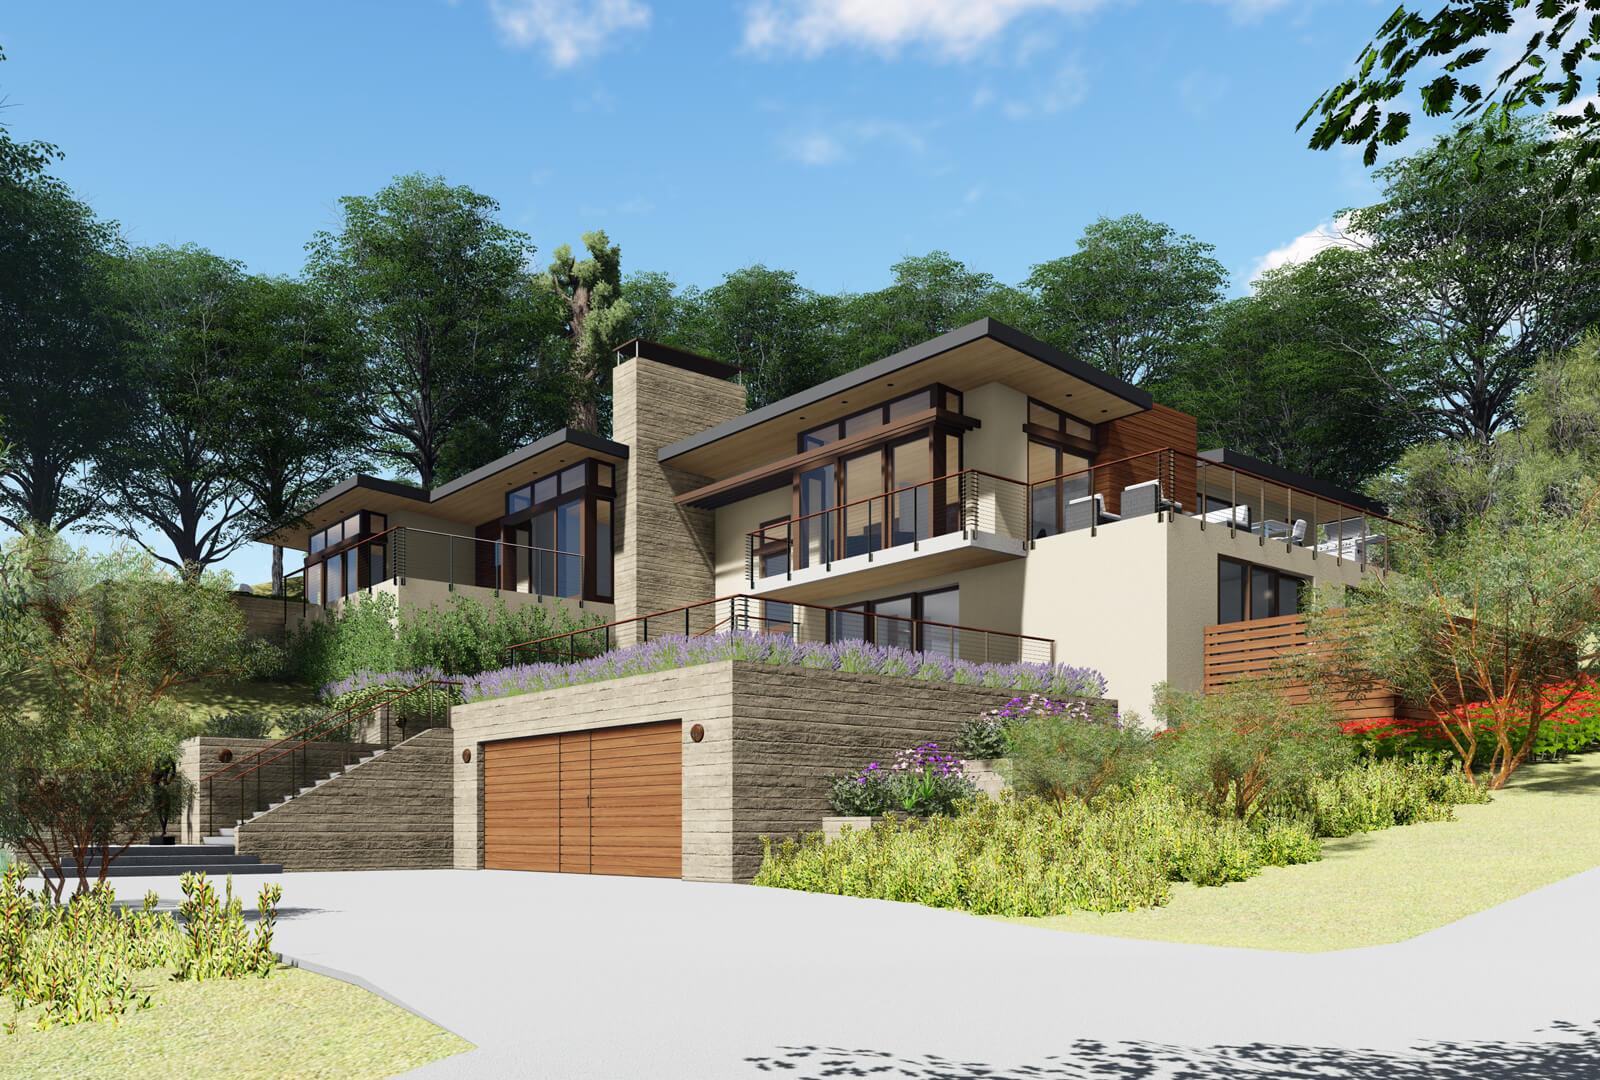 KNR Design Studio | Woodside Modern House Full Tear-Down And Rebuild